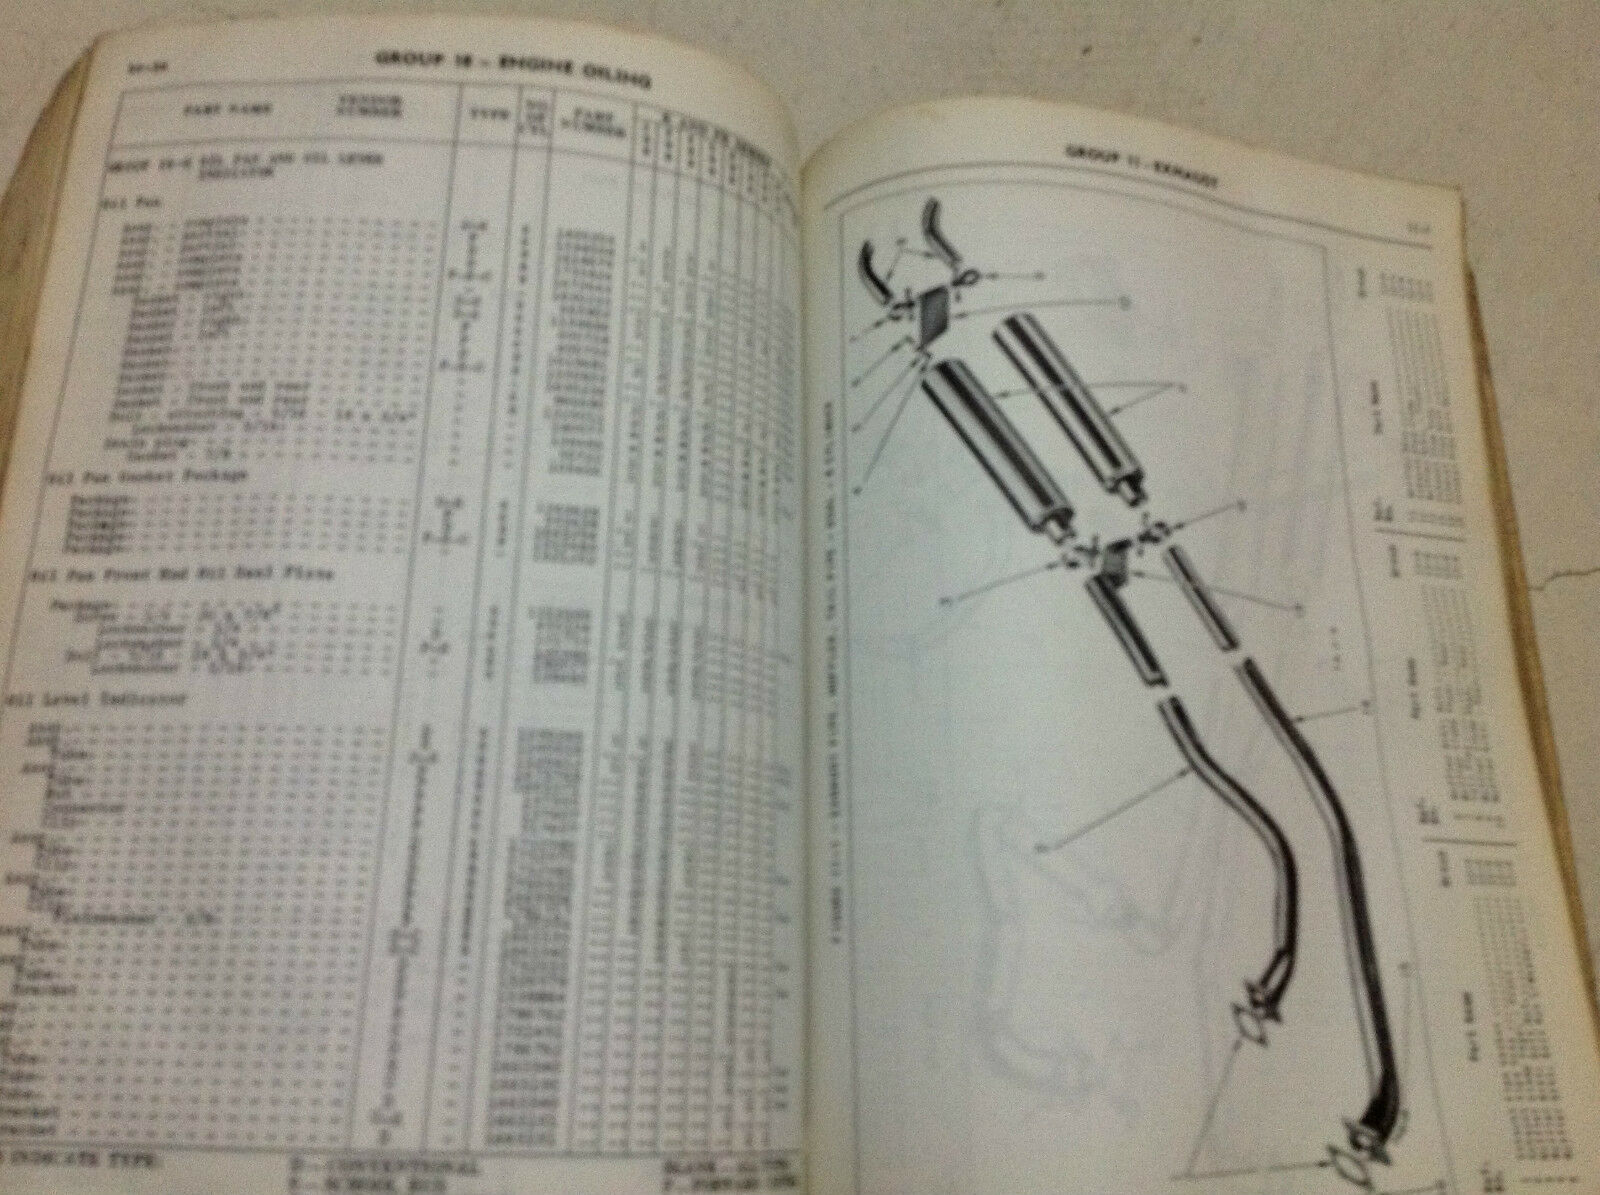 1957 Dodge Truck K FK Serie Teile List Manuell Cdn OEM Fabrik WM 4367 image 2